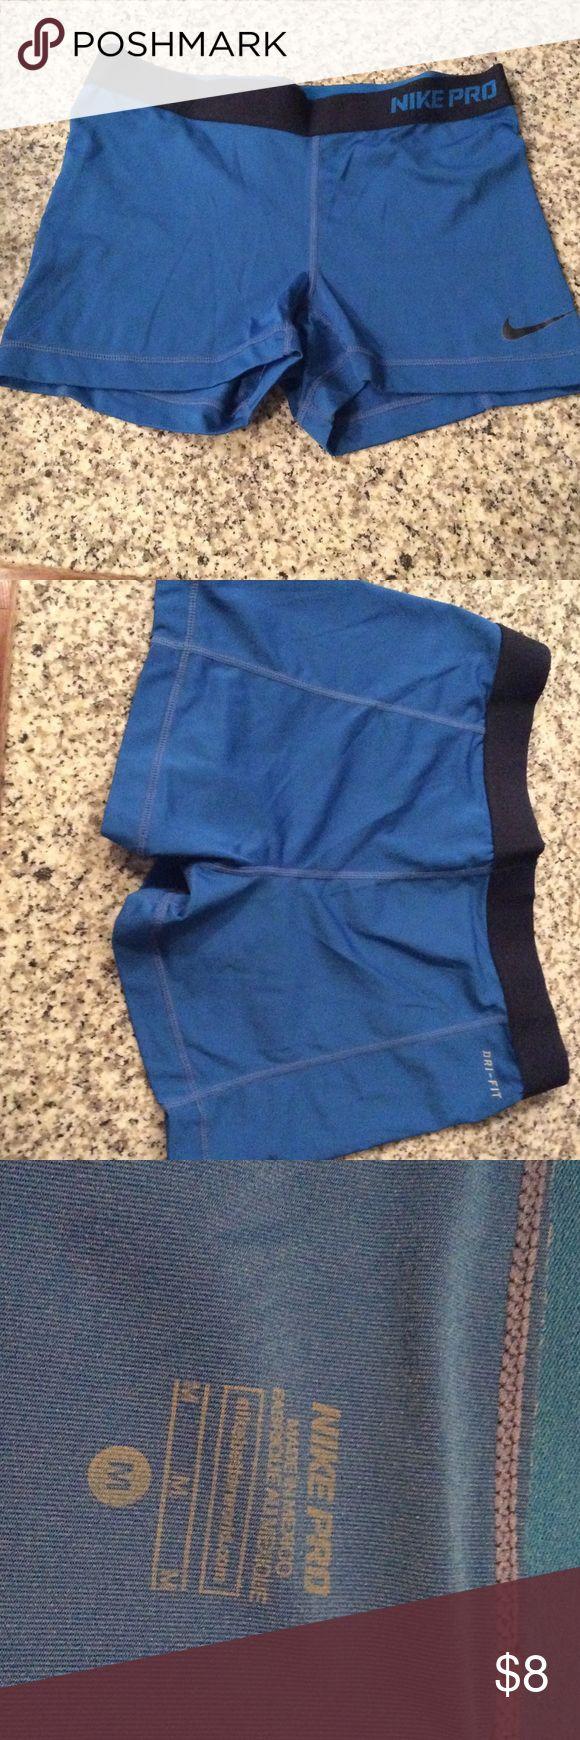 Nike Pro spandex shorts size Medium Nike Pro spandex shorts size Medium. Royal blue. Too small. Never worn. No wear and tear no stains. Nike Shorts